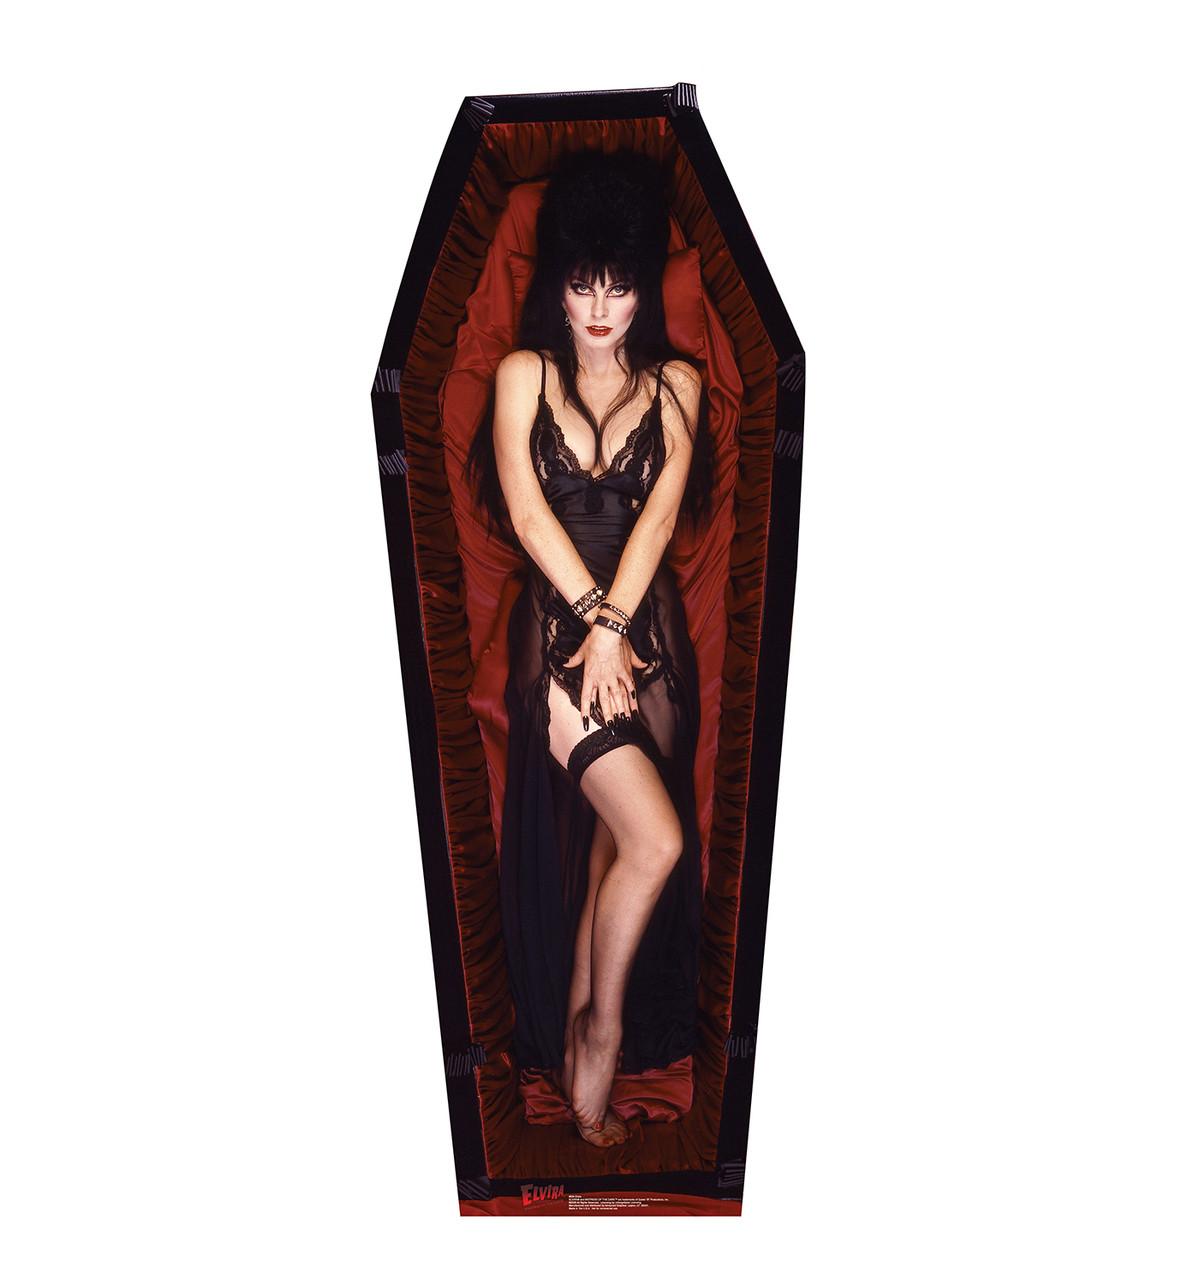 Life-size Elvira - Coffin Cardboard Standup